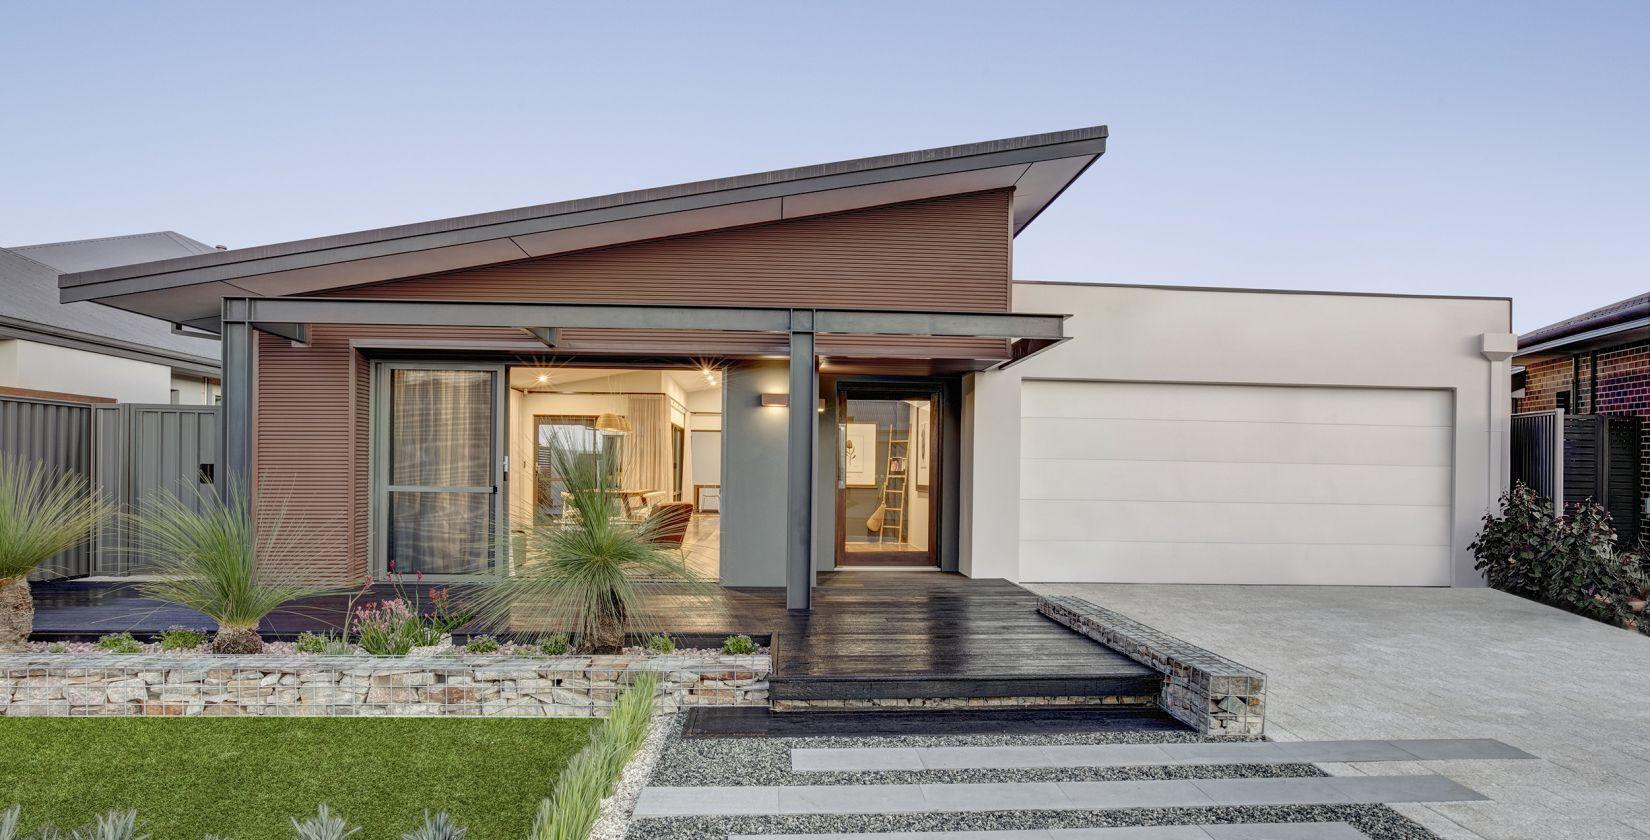 Home Design Ideas Buch: Australiana By Summit Homes